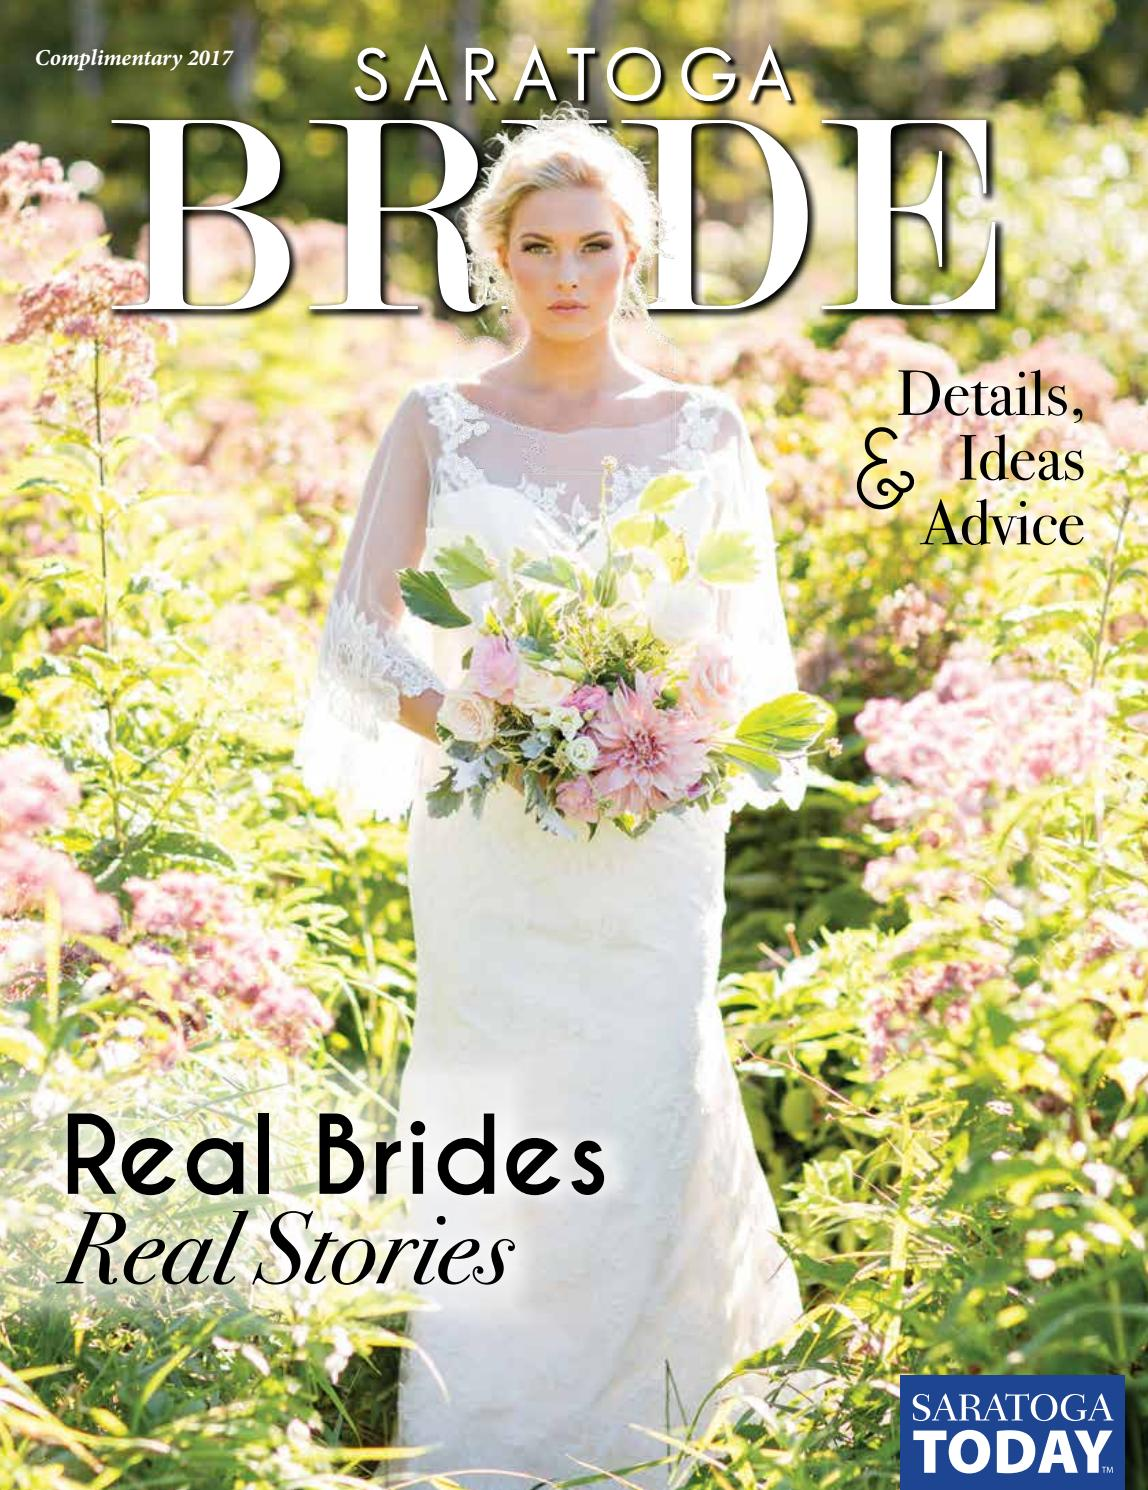 314fc9ec1da Saratoga Bride 2017 by Saratoga TODAY - issuu